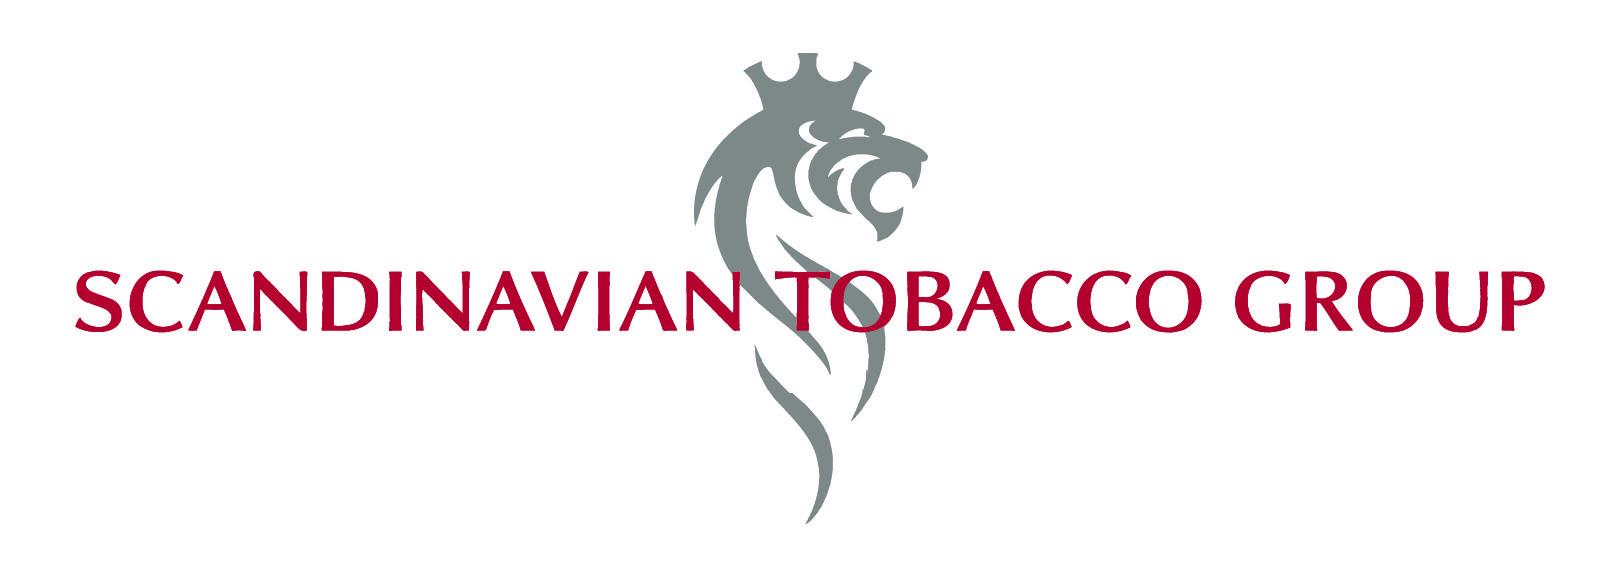 Pin On Scandinavian Tobacco Group